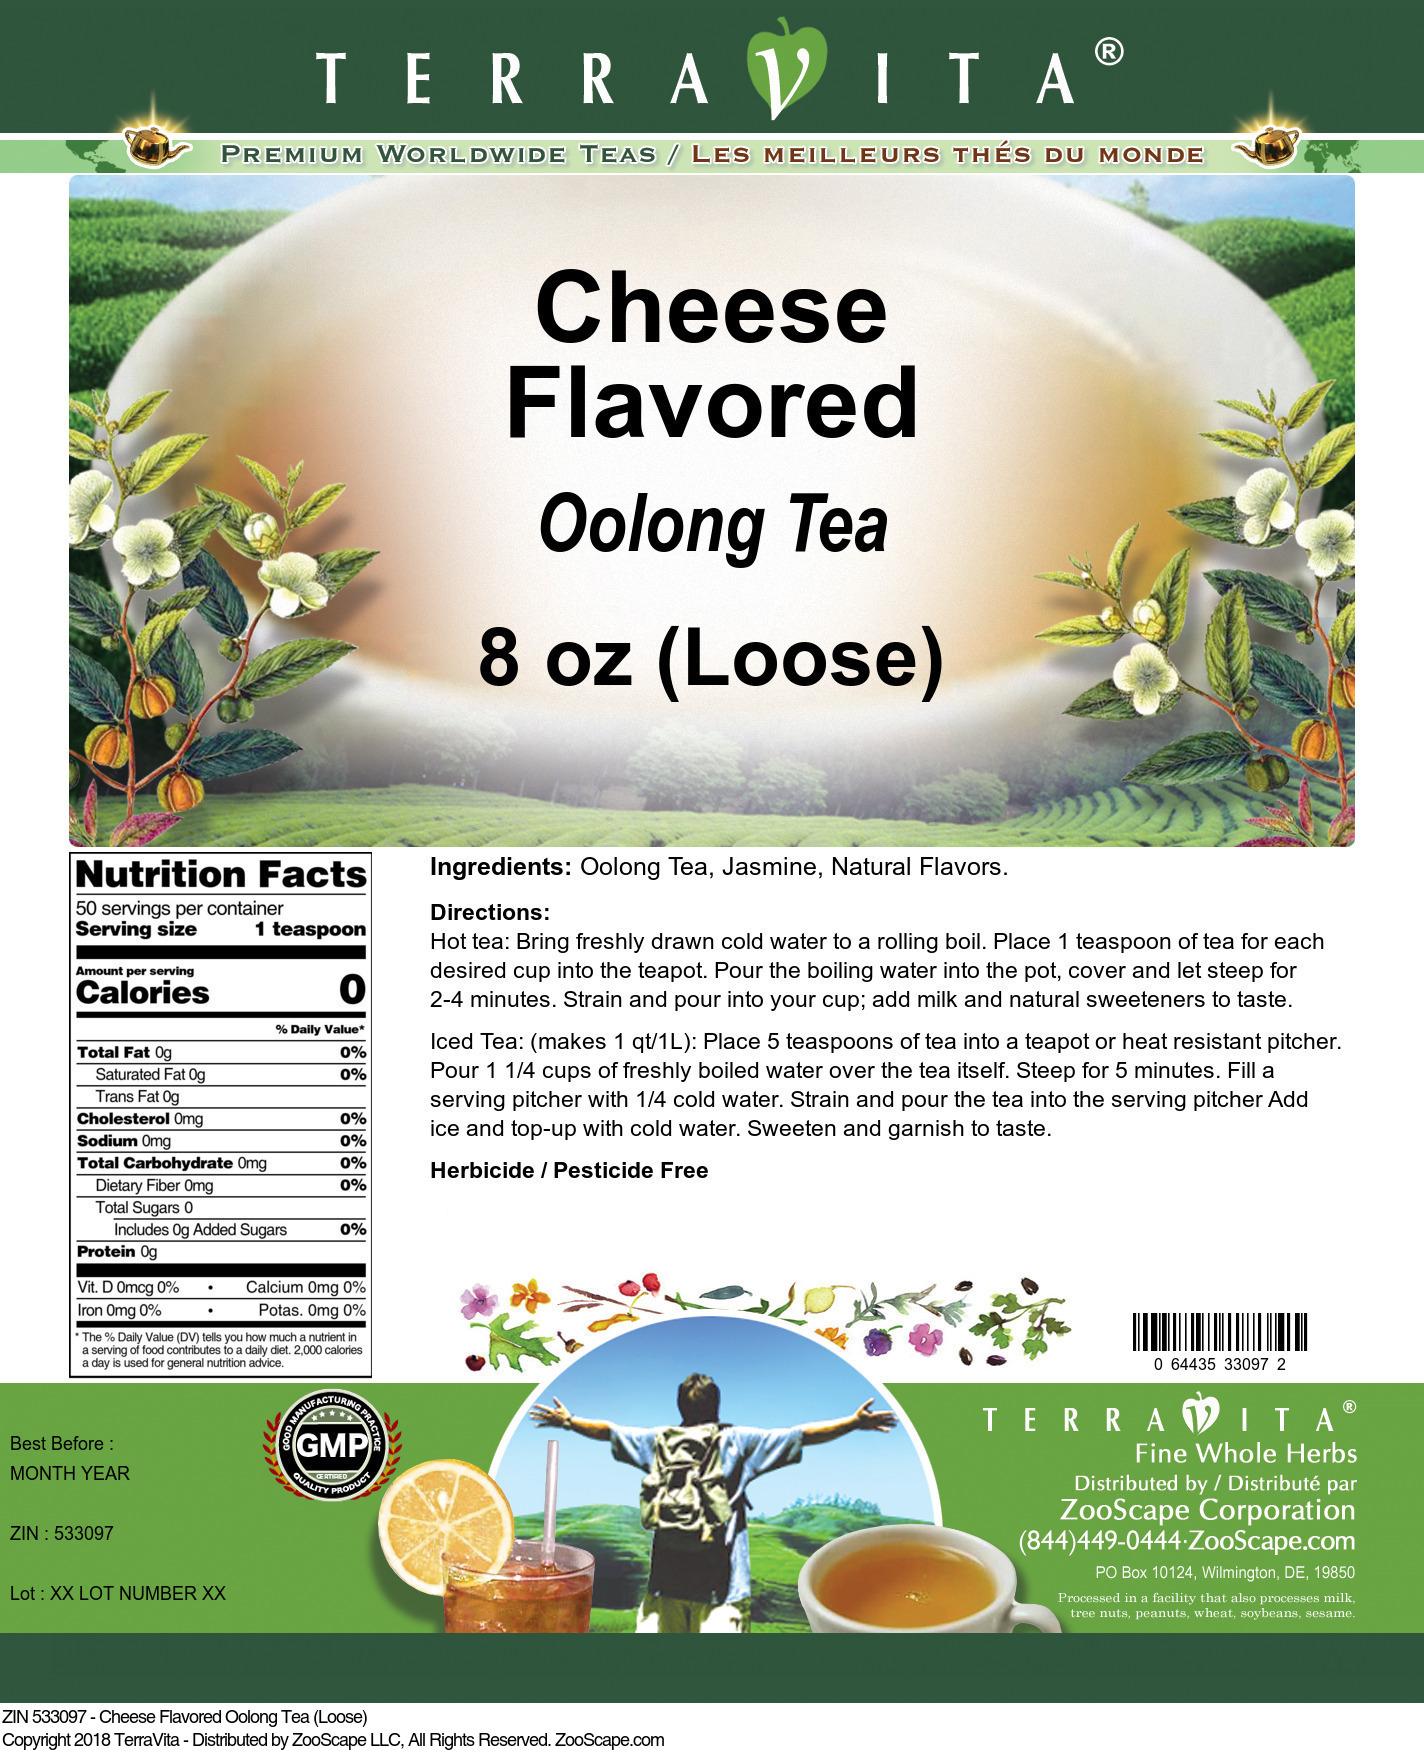 Cheese Flavored Oolong Tea (Loose)